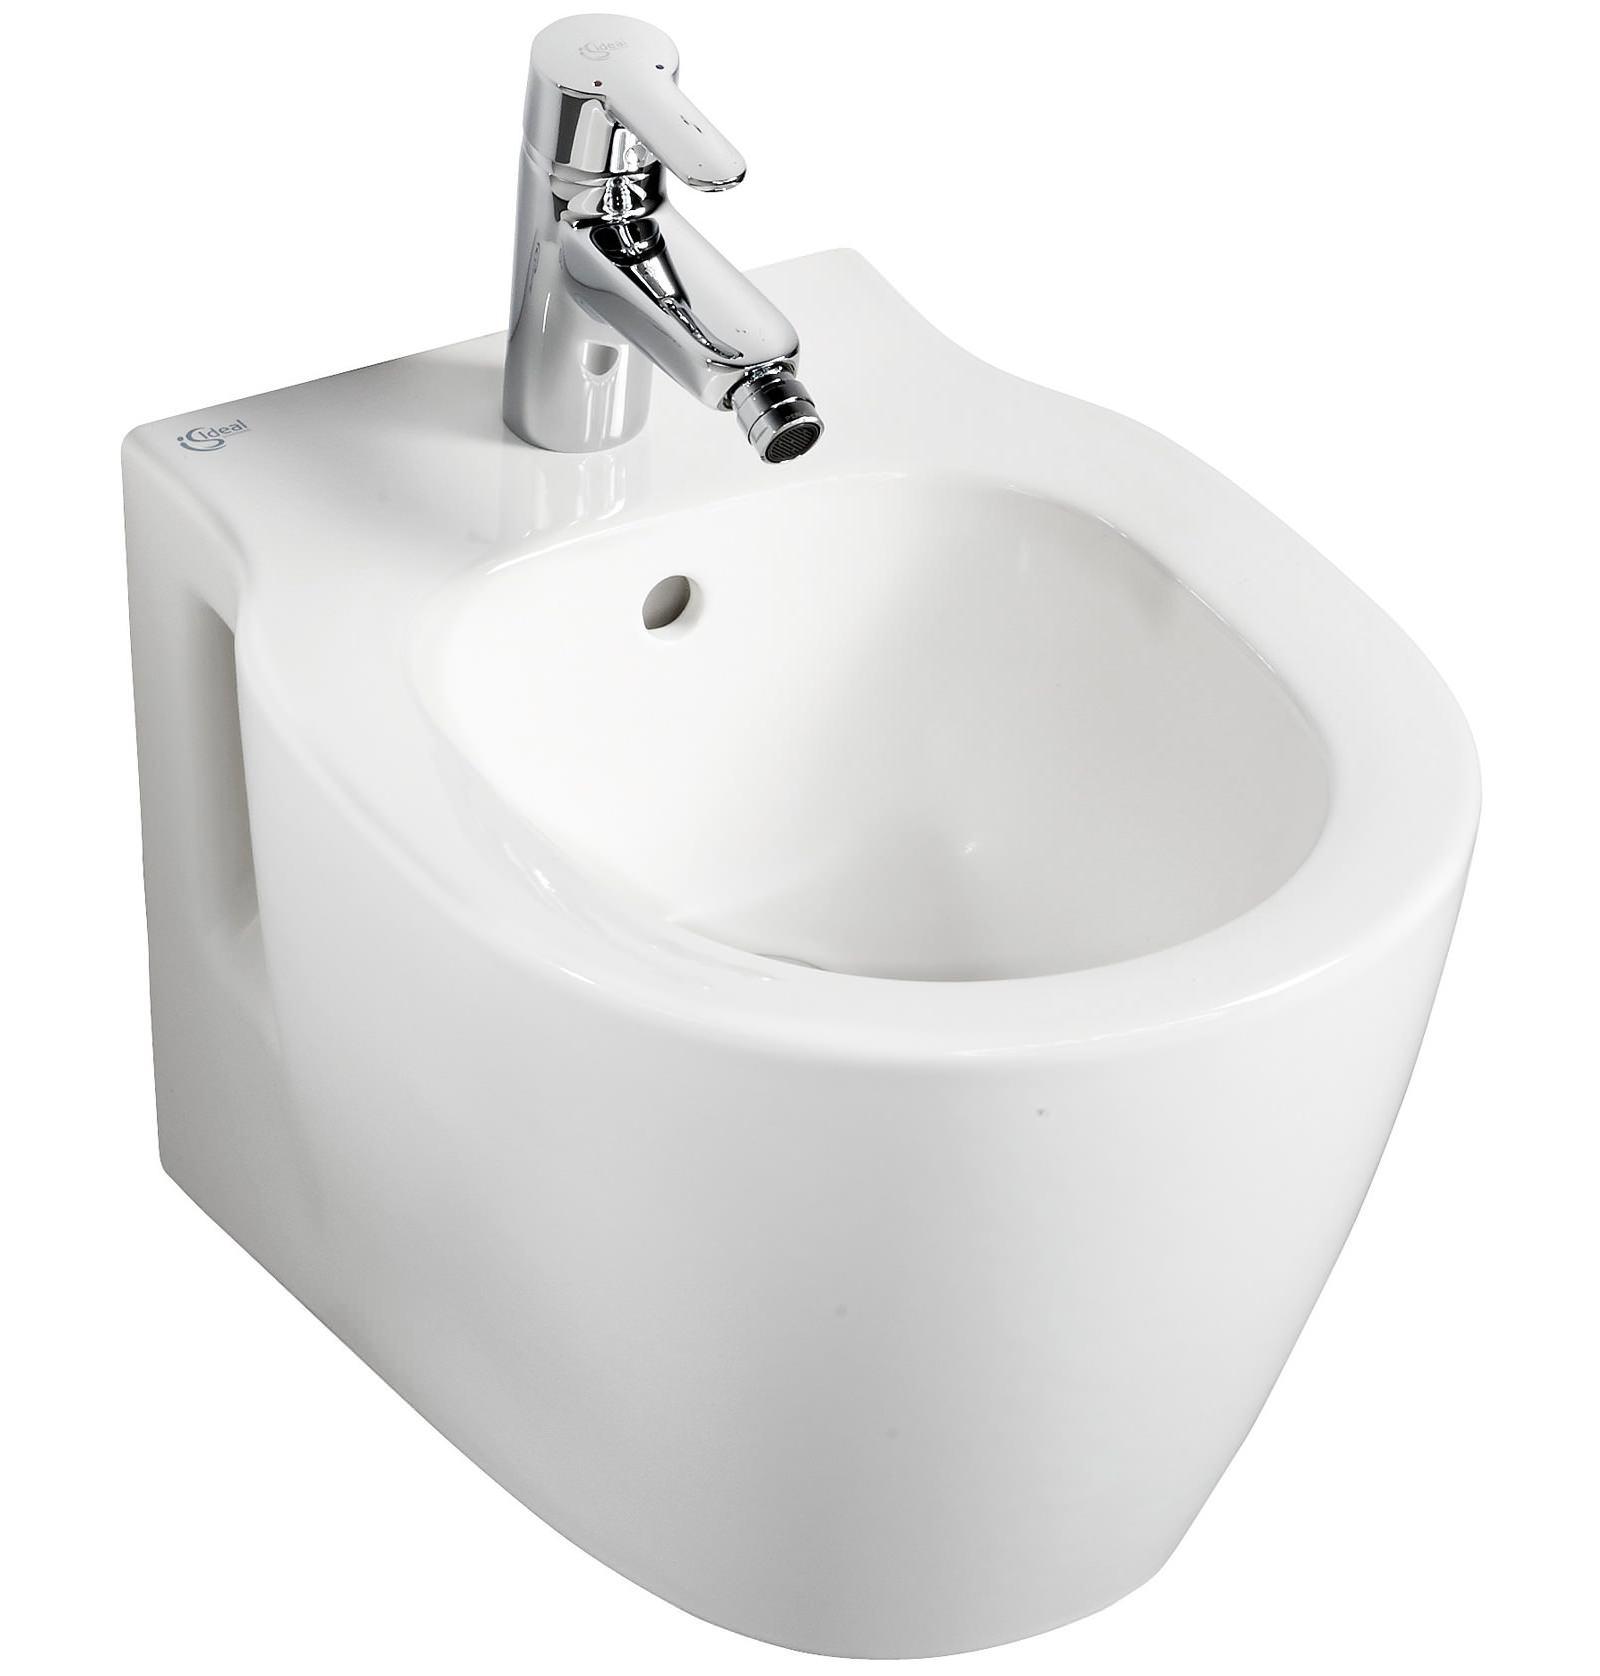 Ideal standard concept space compact 1 taphole bidet 480mm for Bidet ideal standard